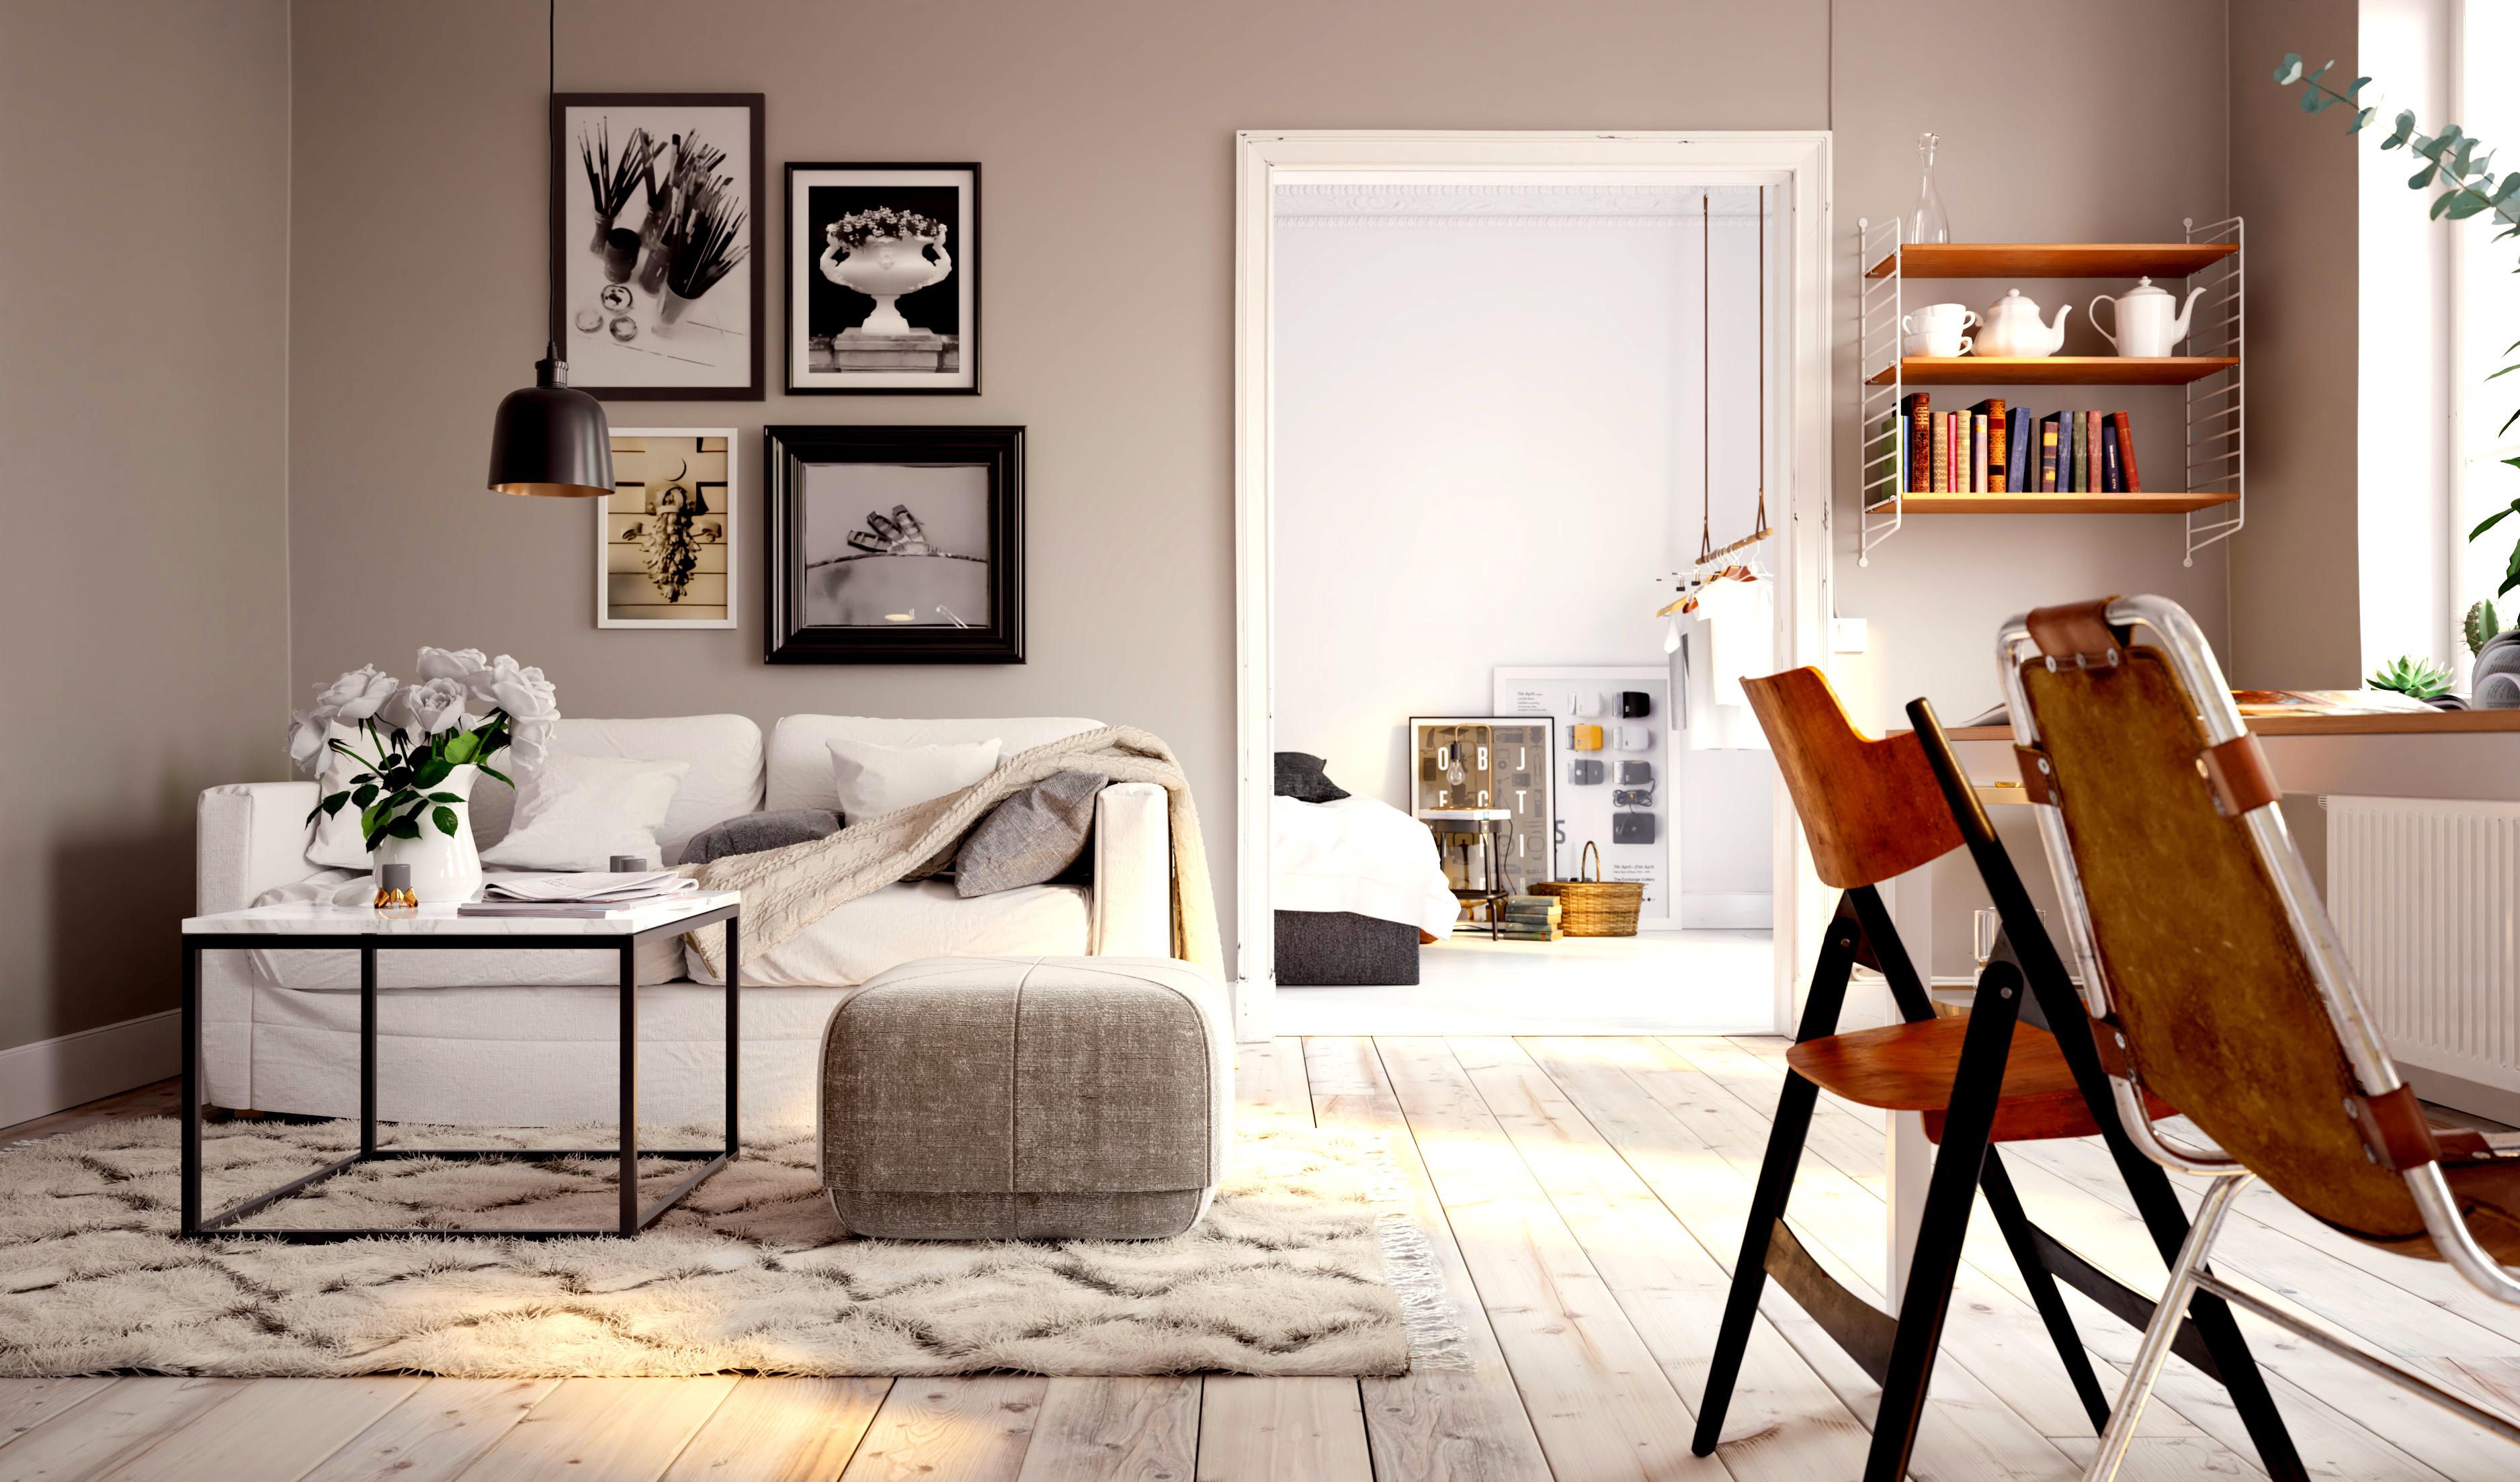 Live Sympli Offers Alternative to Traditional Furniture Rental or Buy Models